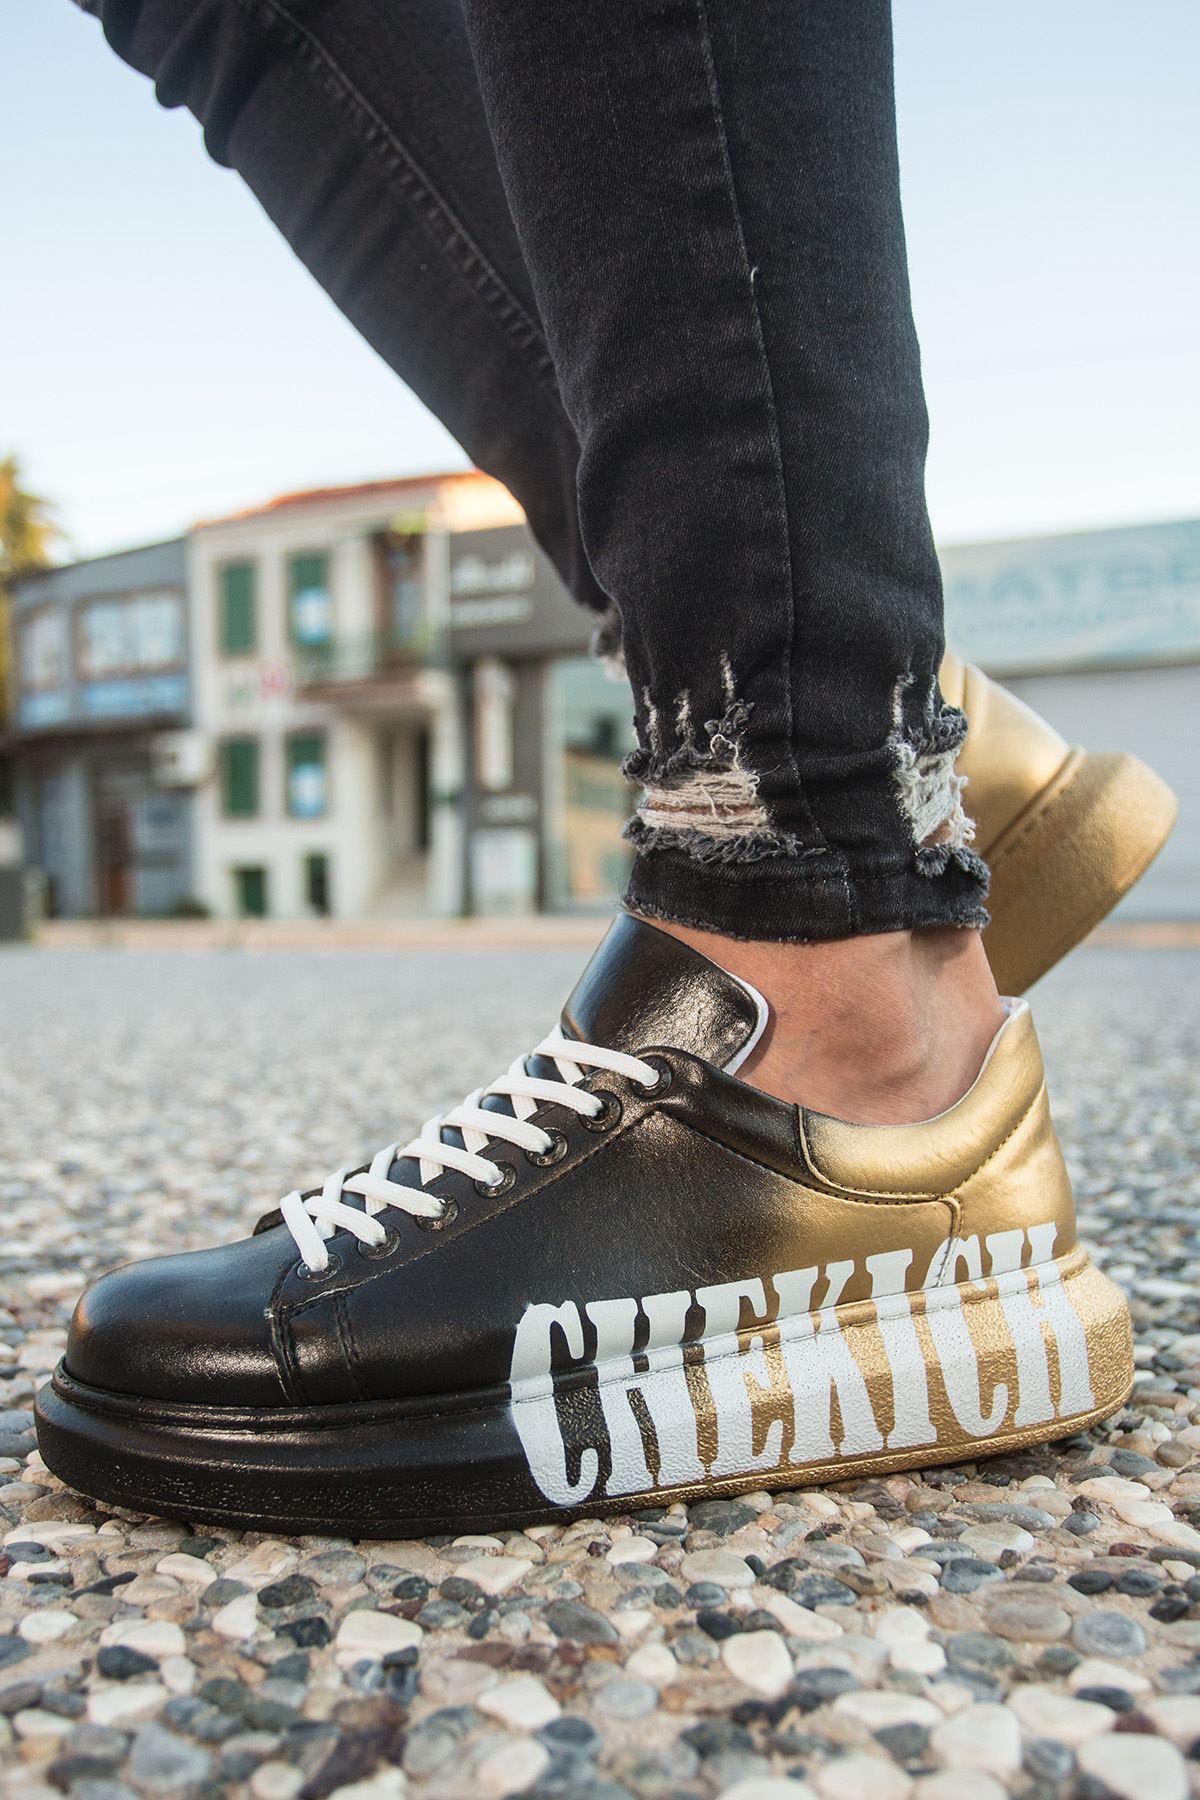 Chekich CH254 BT Erkek Ayakkabı 438 SİYAH / SARI CHEKICH